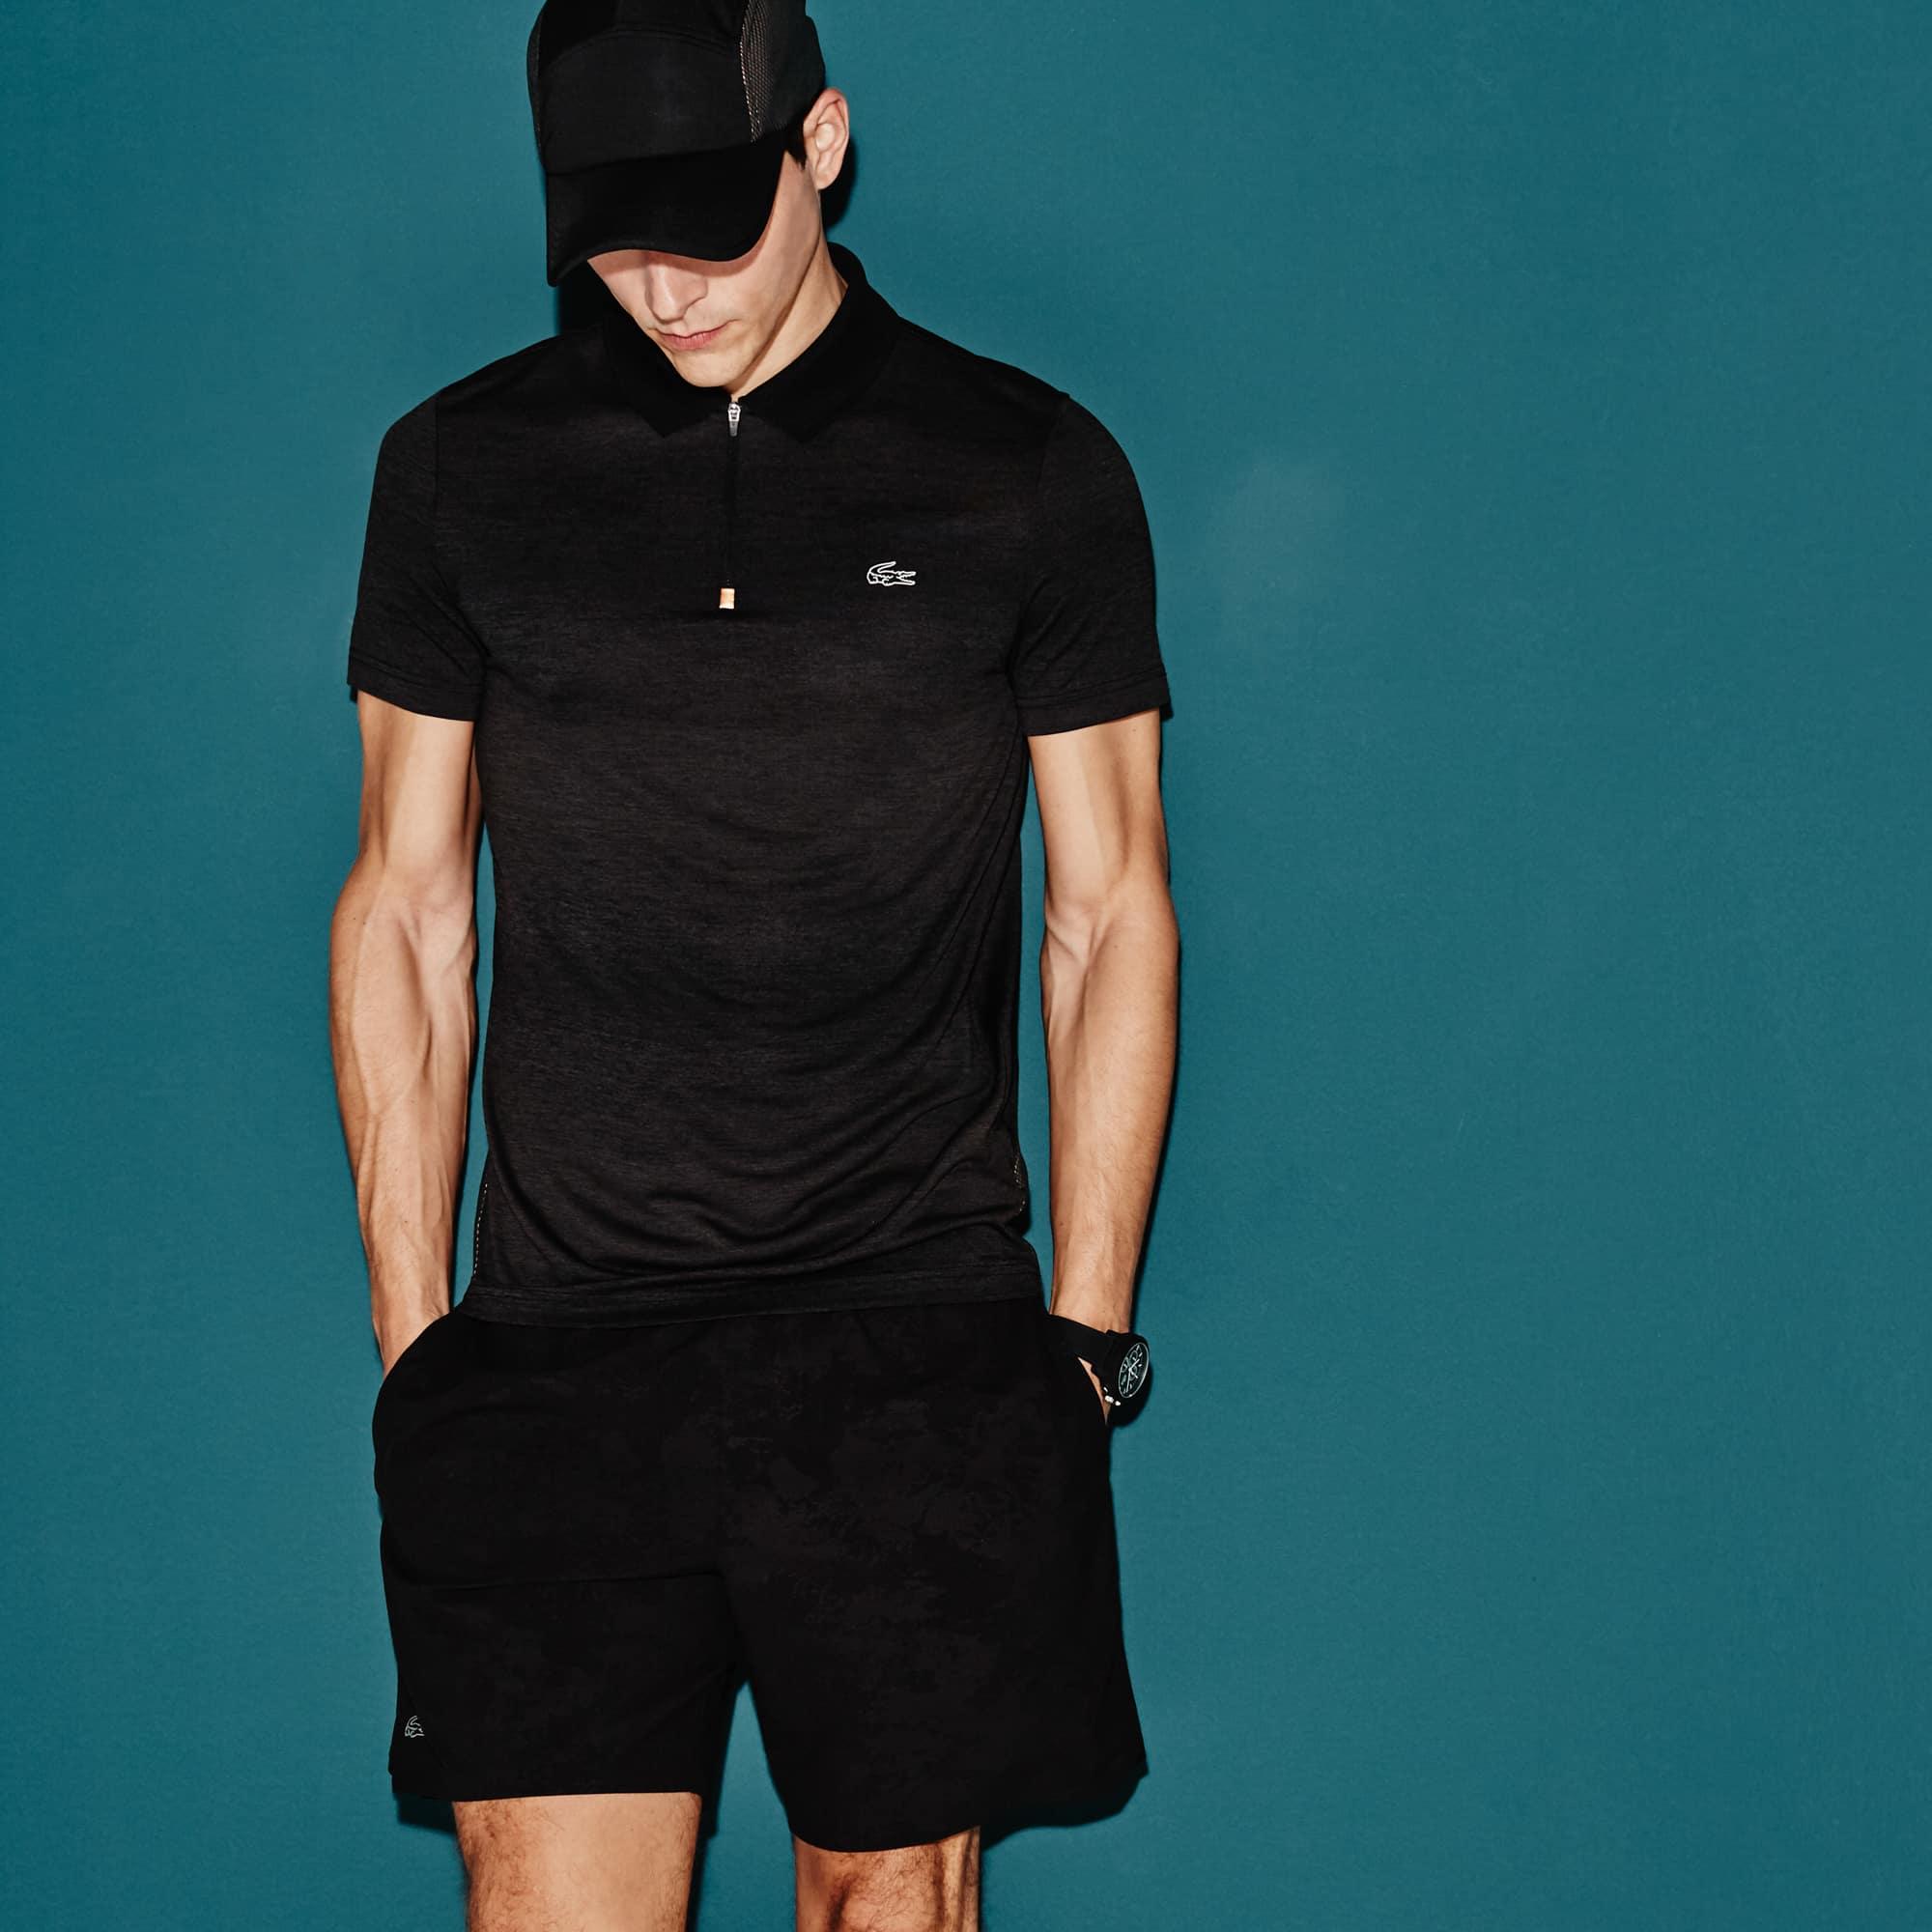 Men's Lacoste SPORT Tennis Zip Neck Mesh Back Tech Jersey Polo